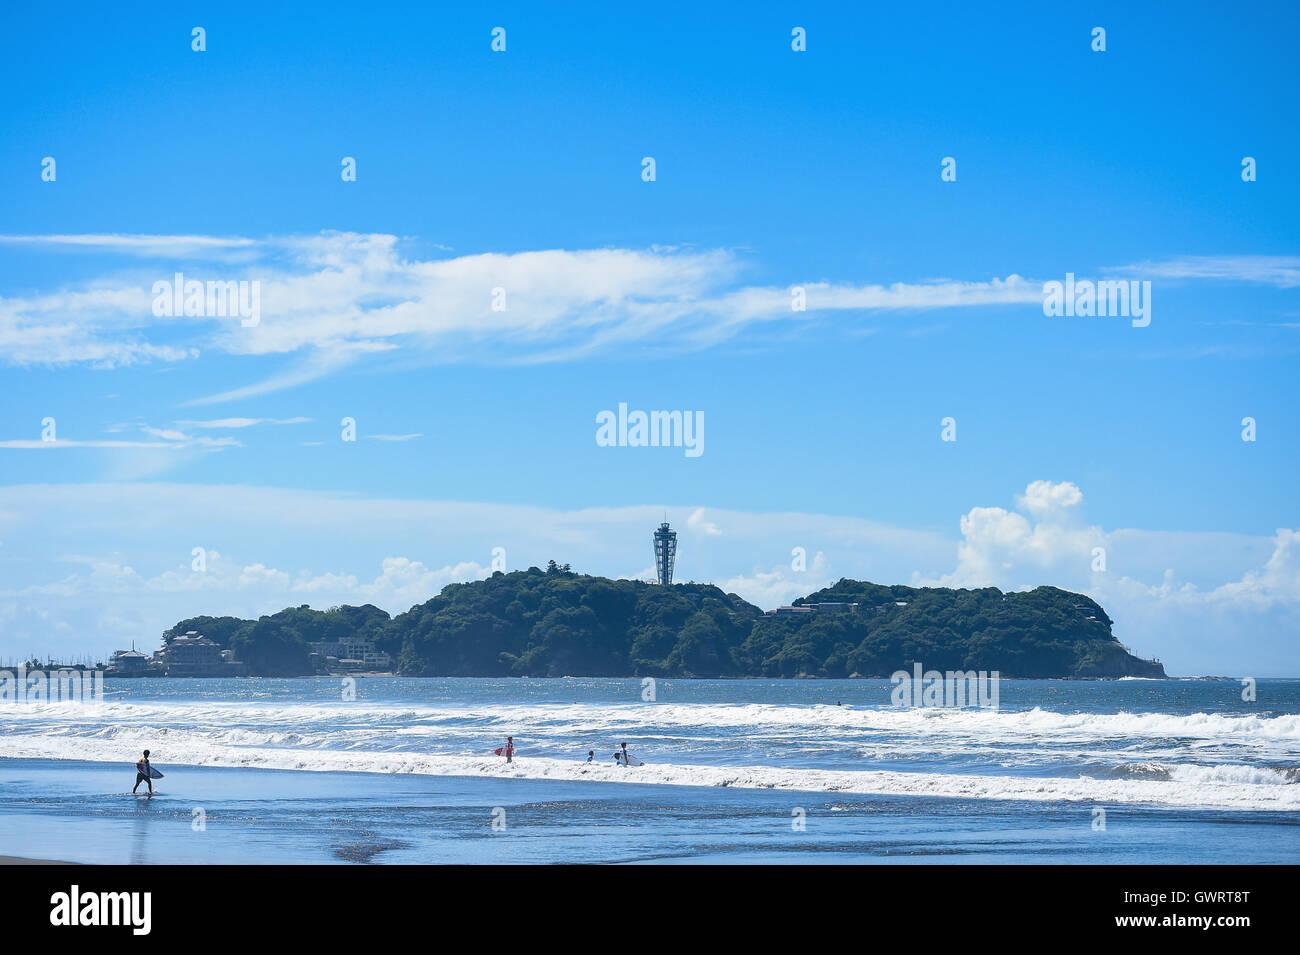 Surfers at the beach in Enoshima, Kanagawa Prefecture, Japan - Stock Image